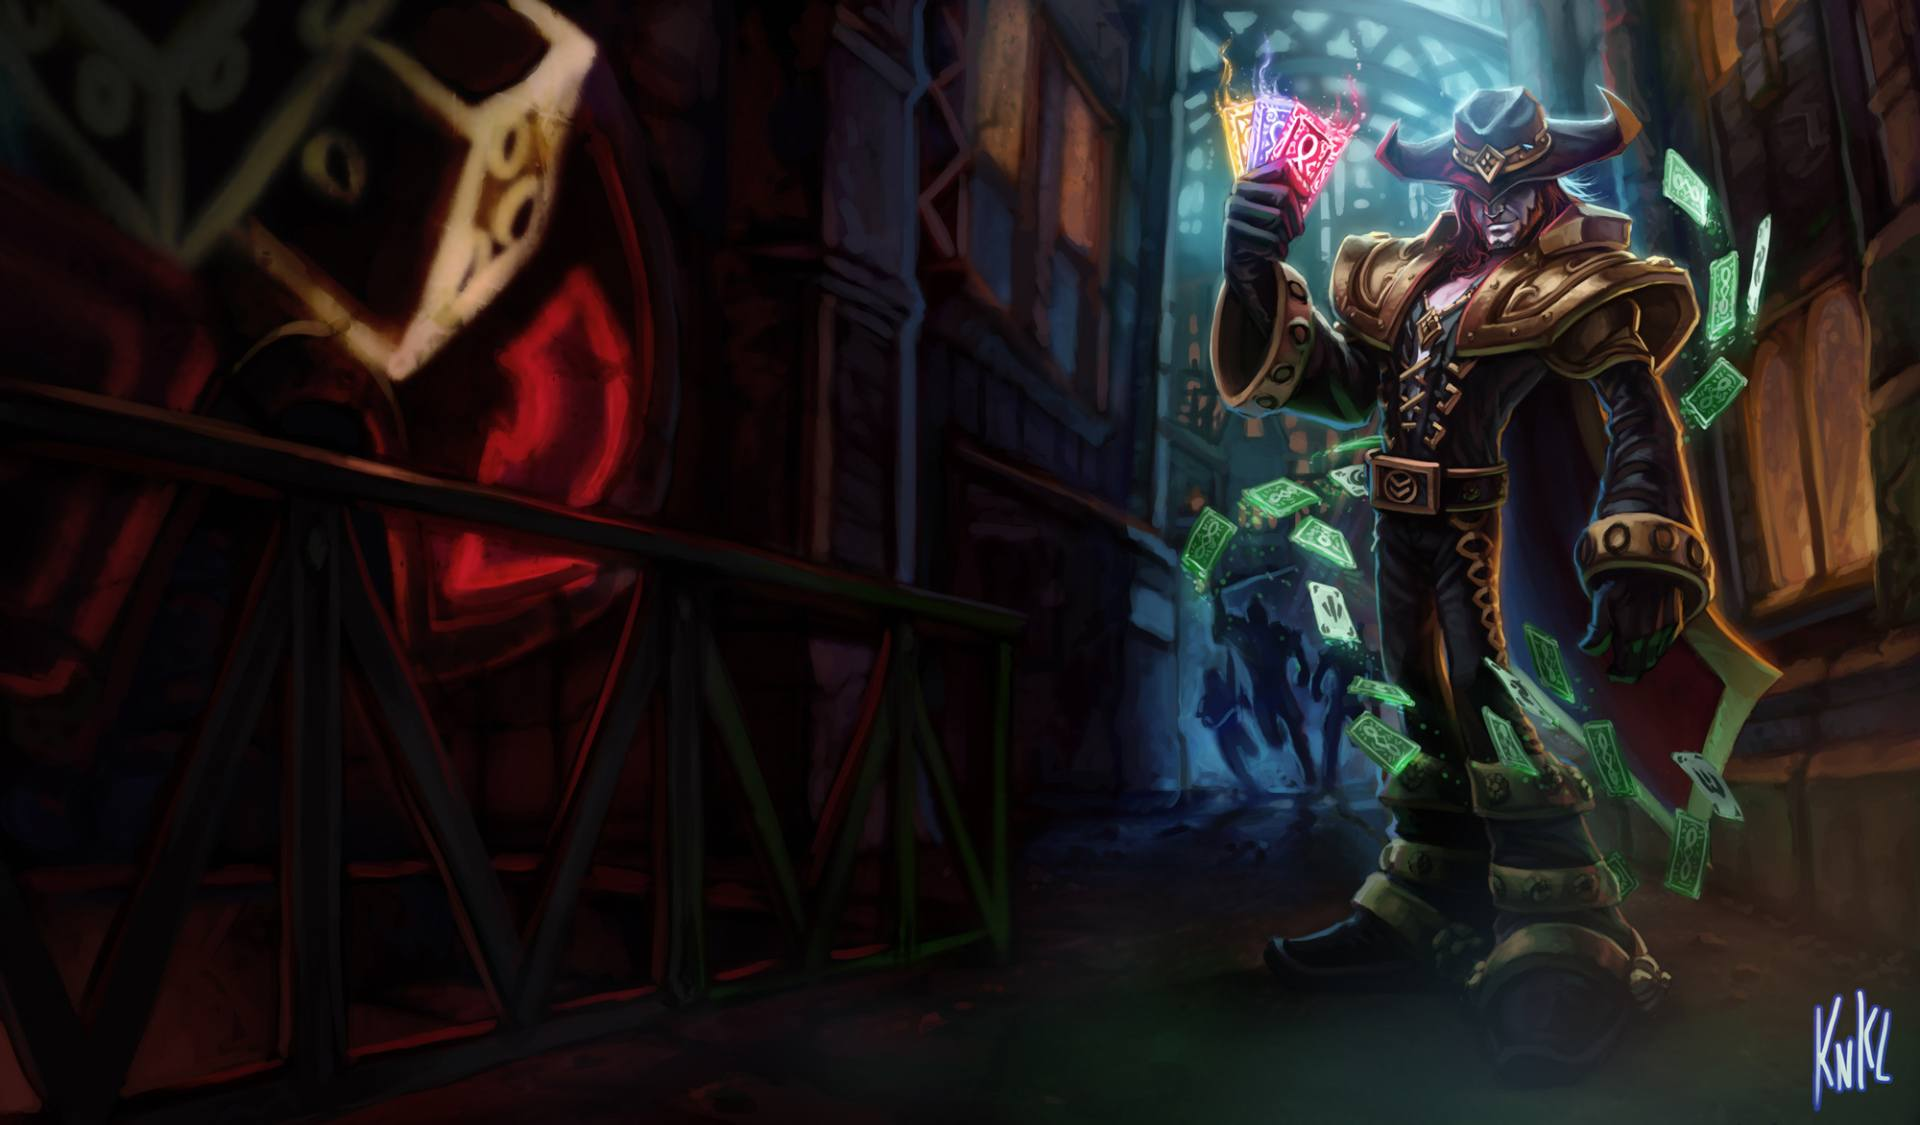 League of Legends Wallpaper 064